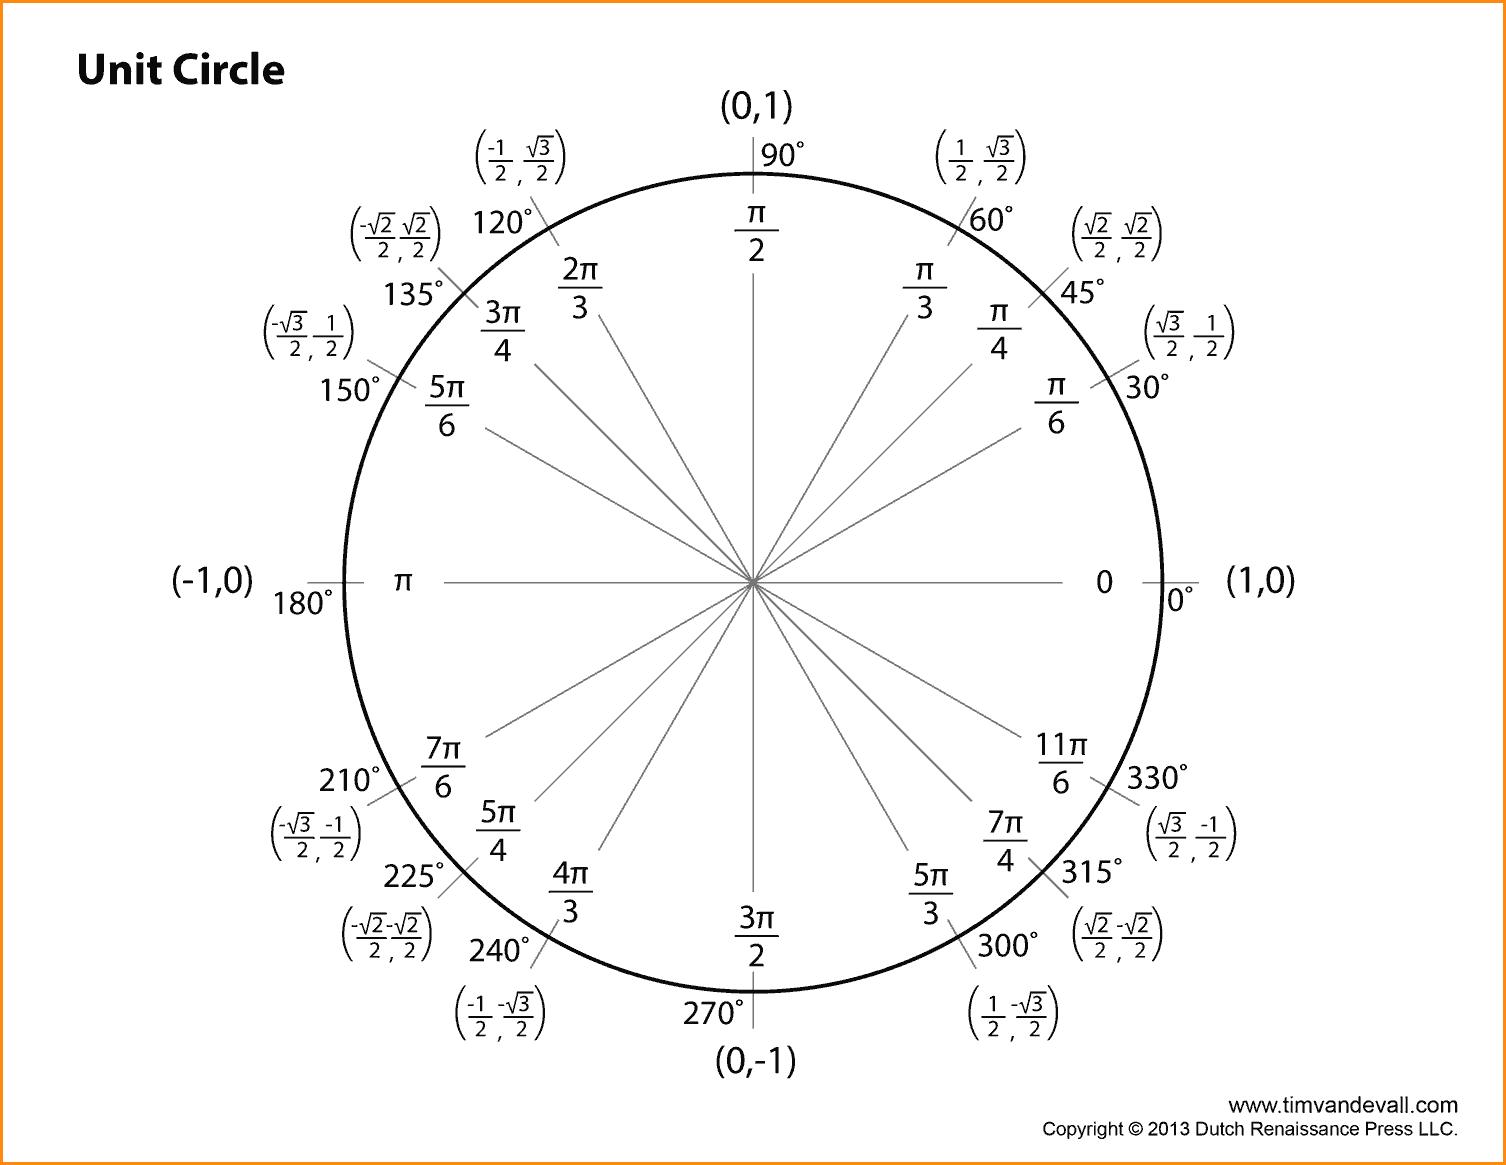 Unit Circle Diagram Unit Circle Chart Png Loan Application Form Unit Circle Radians Blank Unit Circle Trigonometry